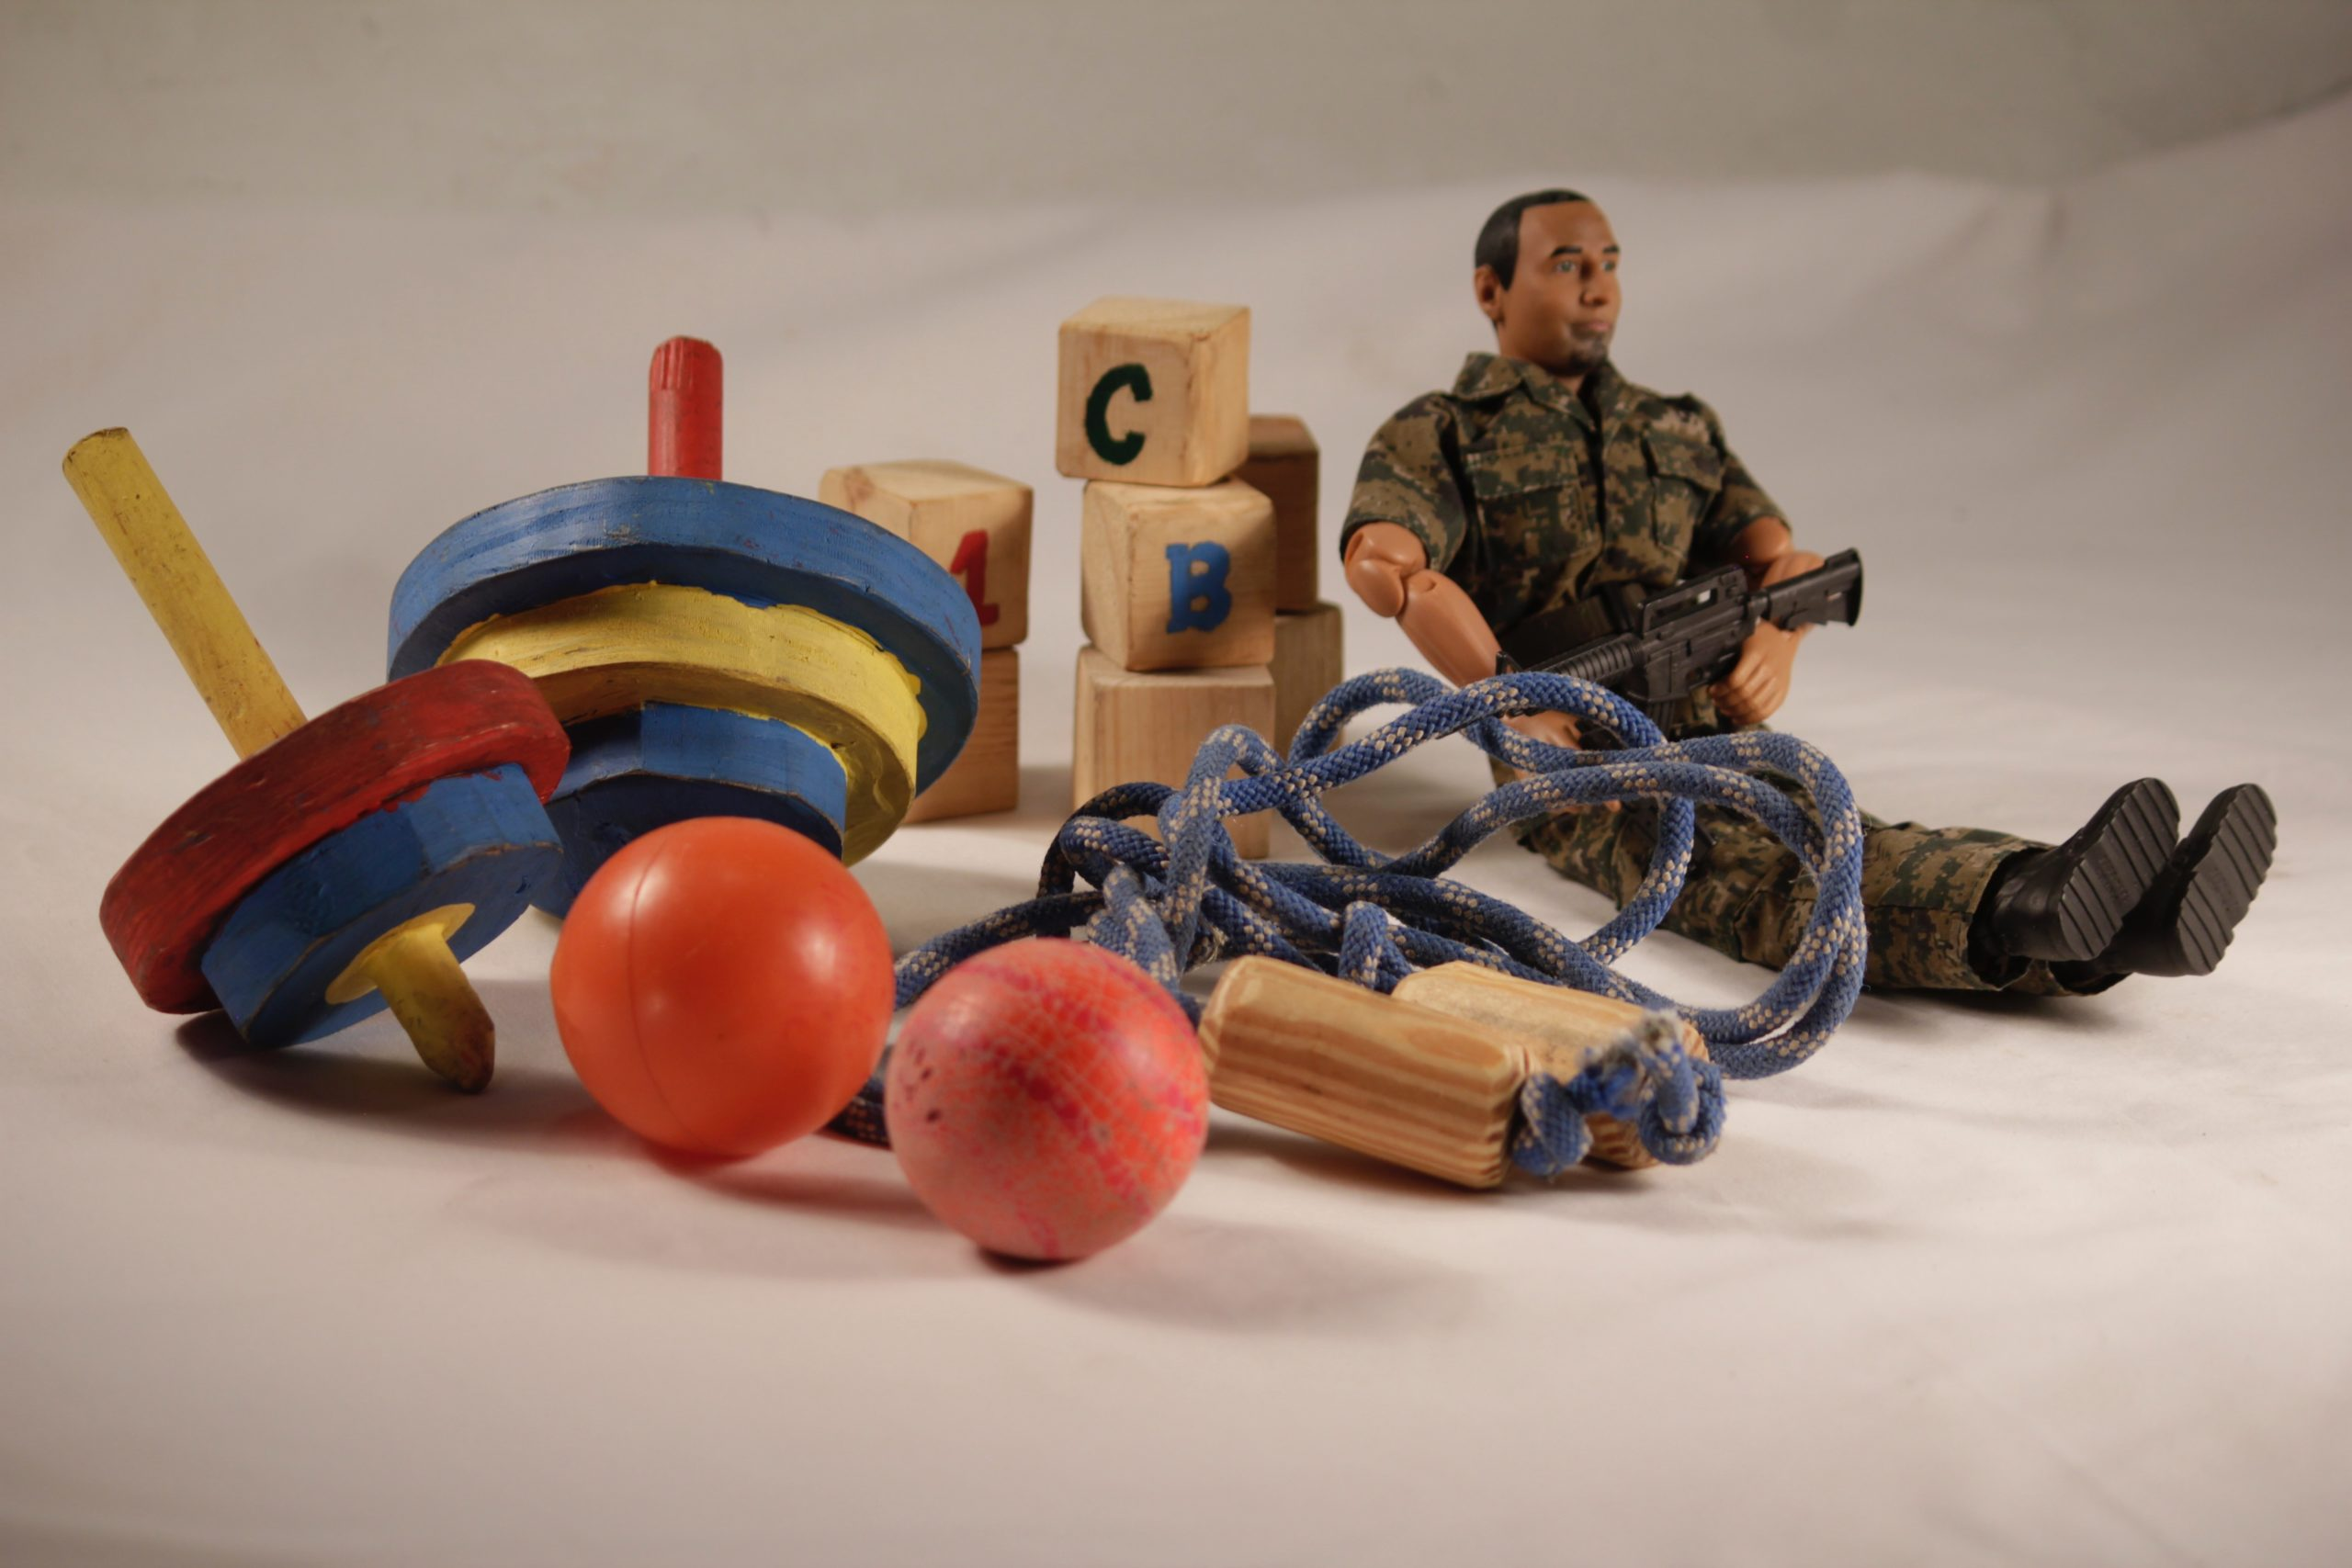 Toy, Vintage Play